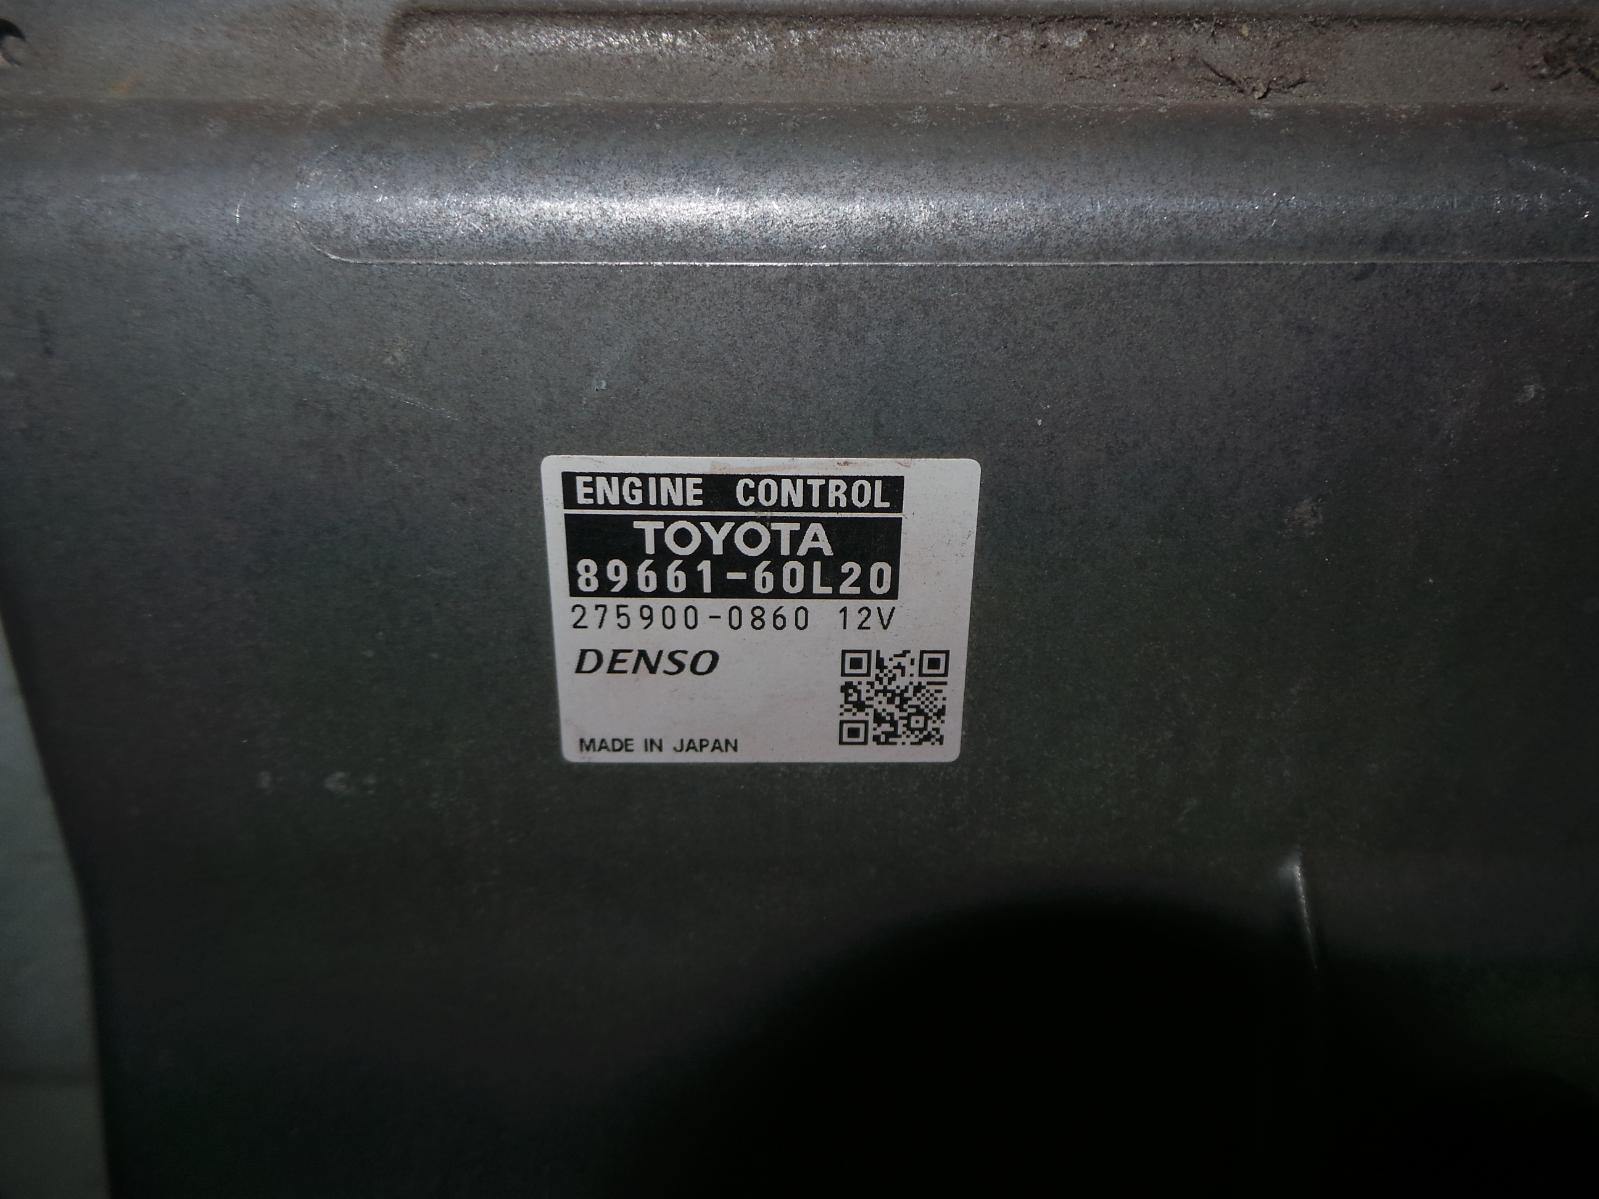 TOYOTA LANDCRUISER, Ecu, 70 SERIES (UPDATE), ENGINE ECU, 4.5, DIESEL, P/N 89661-60L20, ECU ONLY, 03/07-